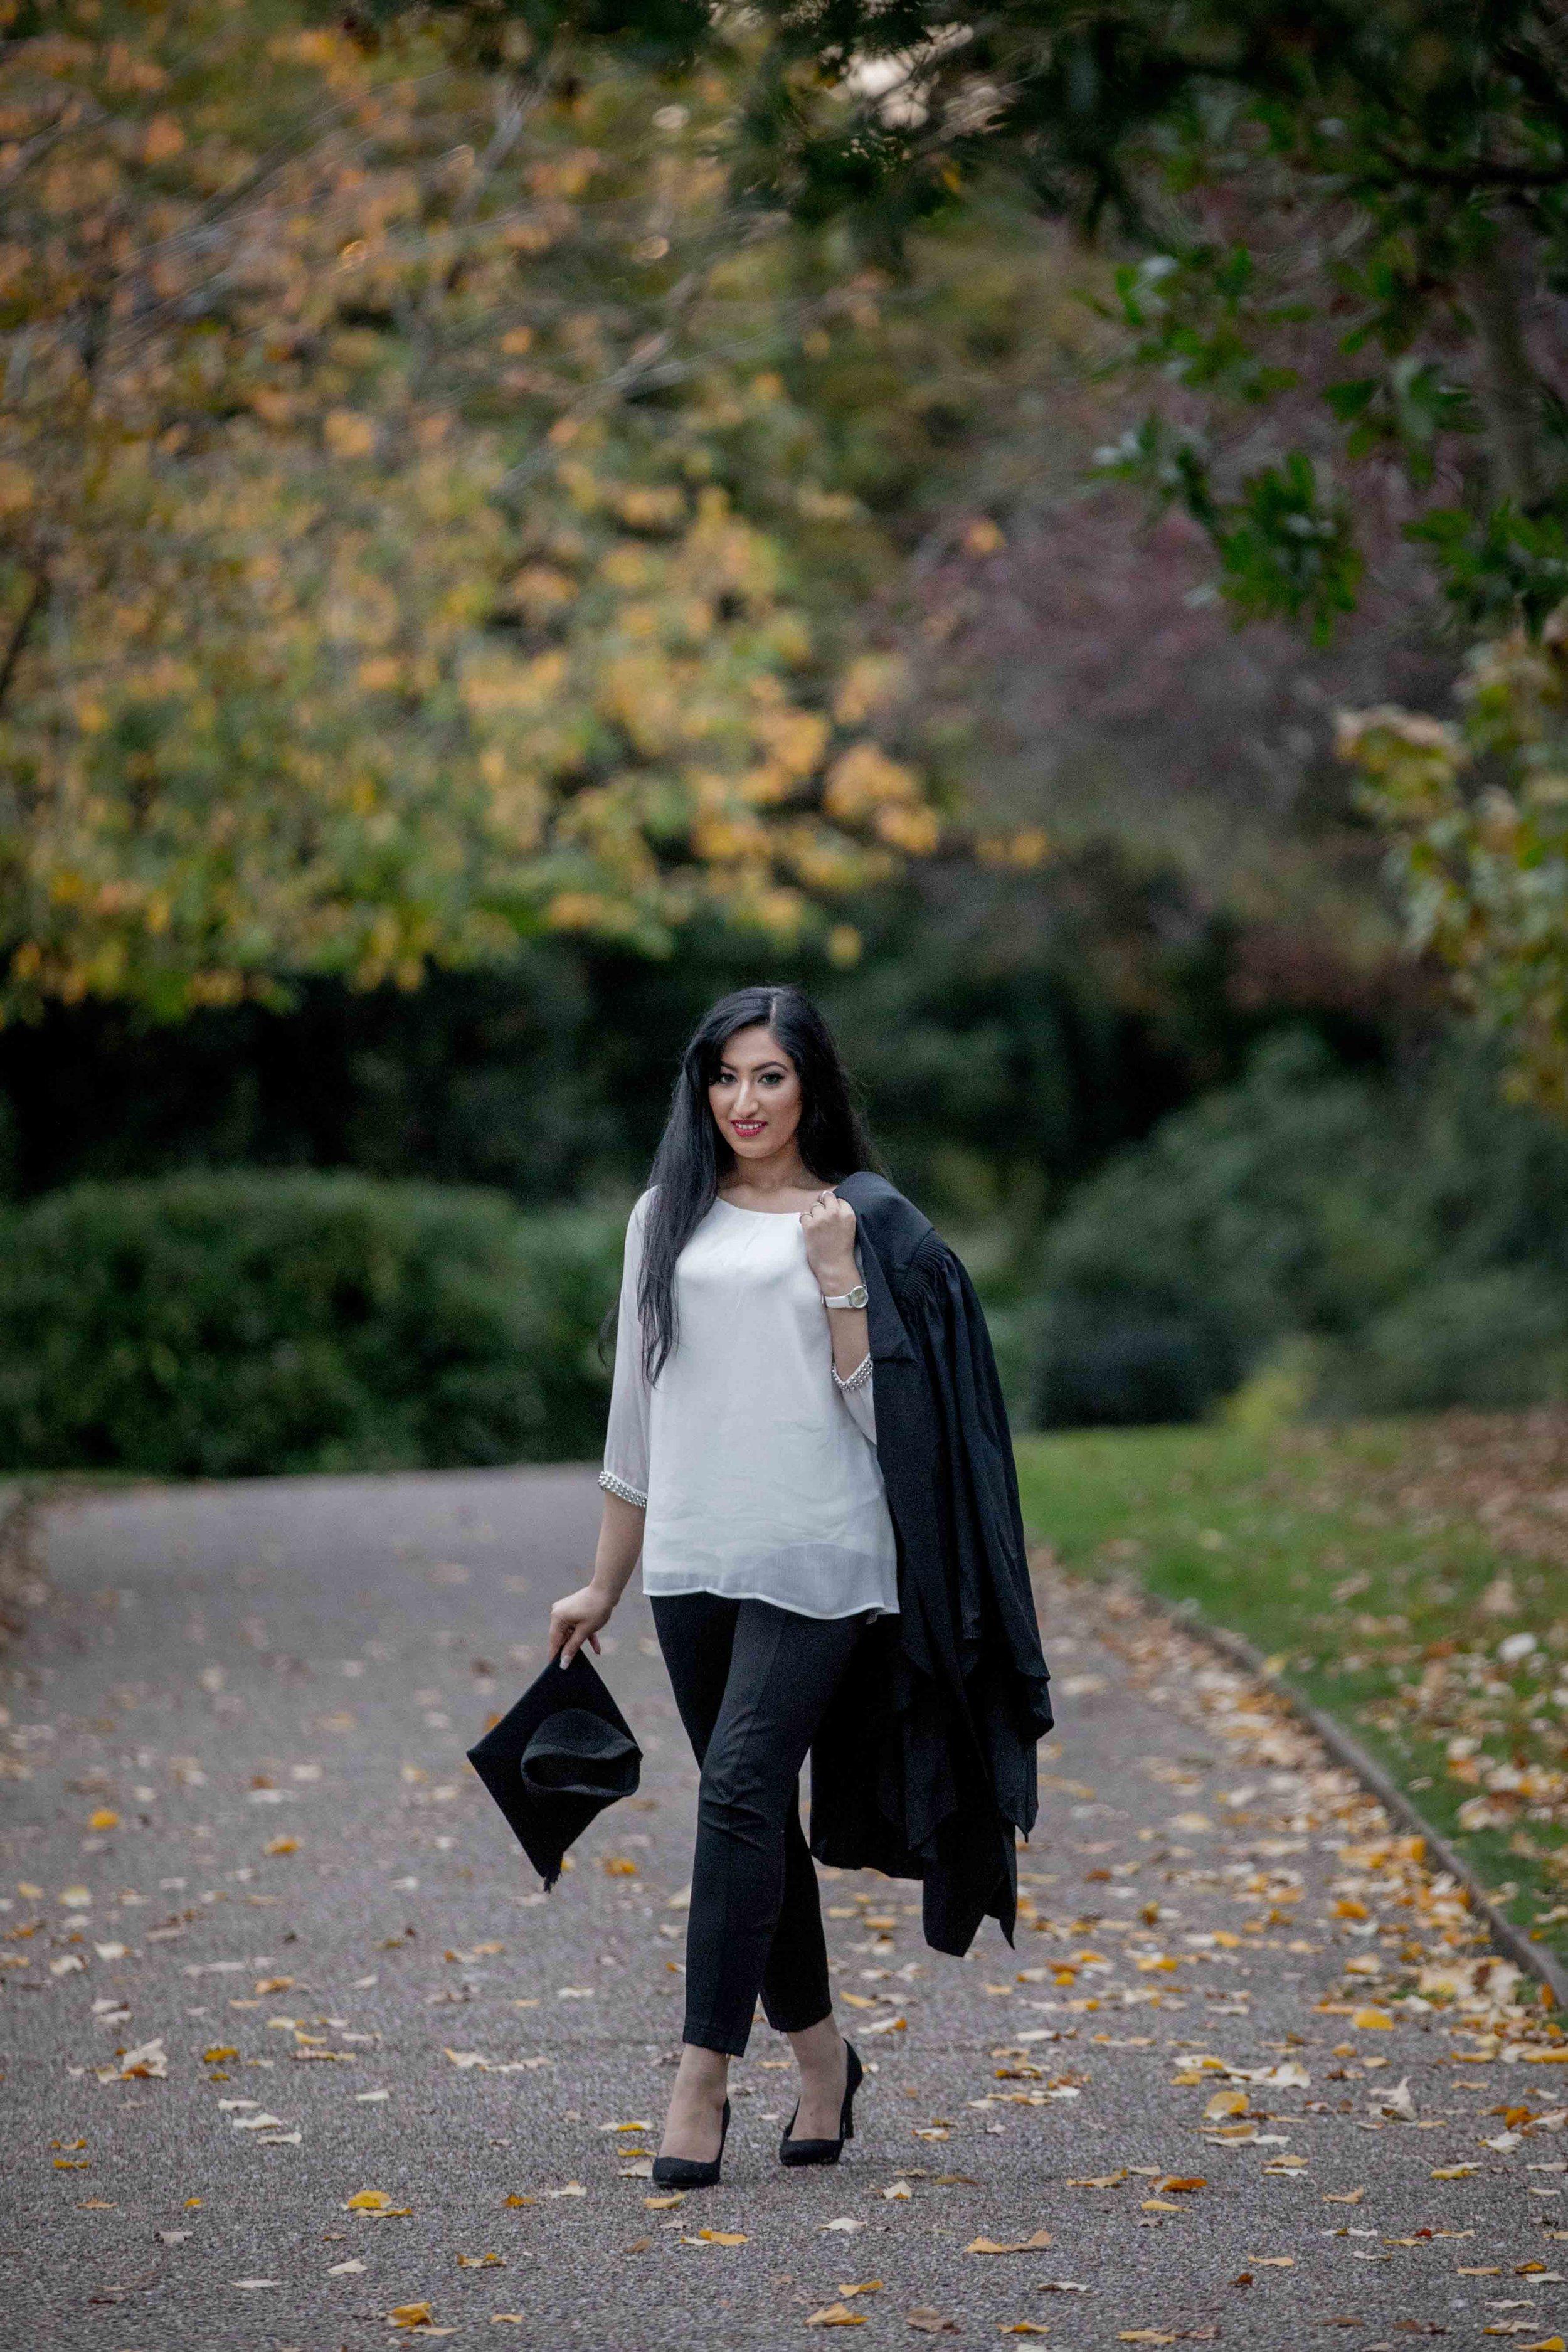 chester-university-graduation-ceremony-photography-photoshoot-graduation-photographer-Bristol-London-Cardiff-Birmingham-Chester-Natalia-smith-photography-21.jpg